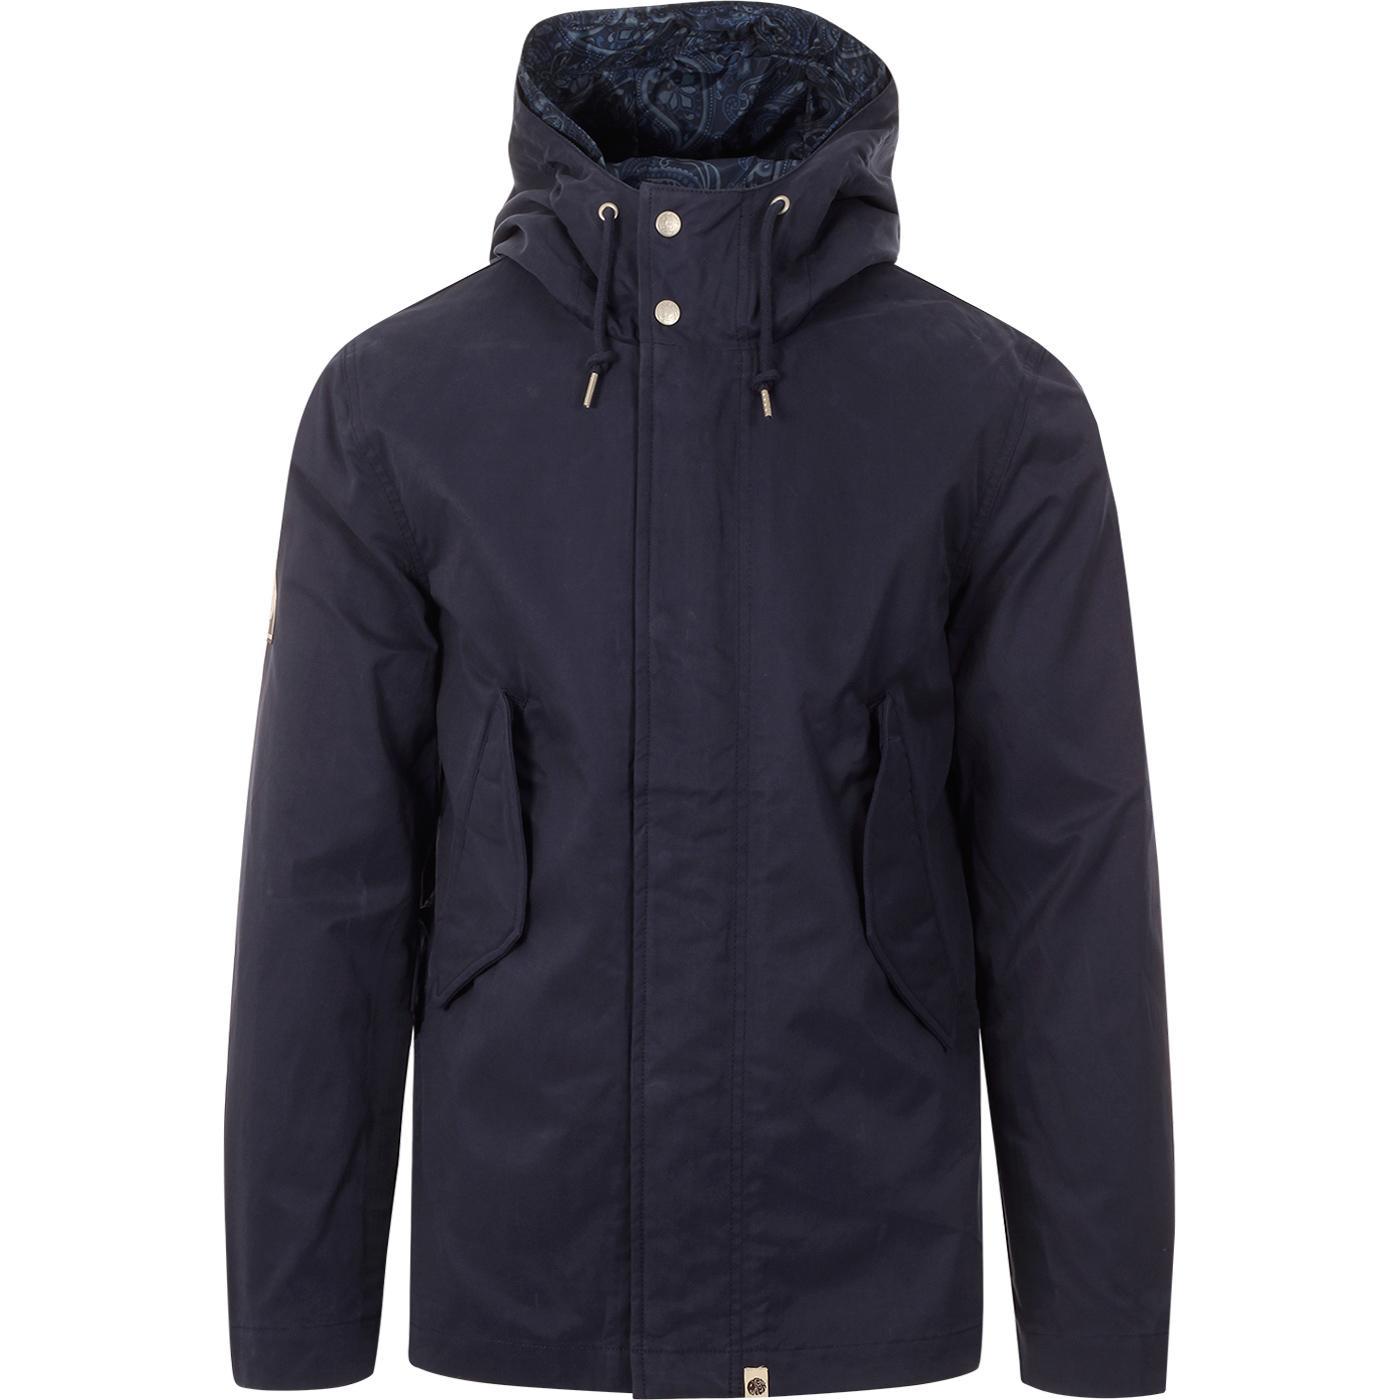 PRETTY GREEN Retro Mod Hooded Cotton Jacket (Navy)